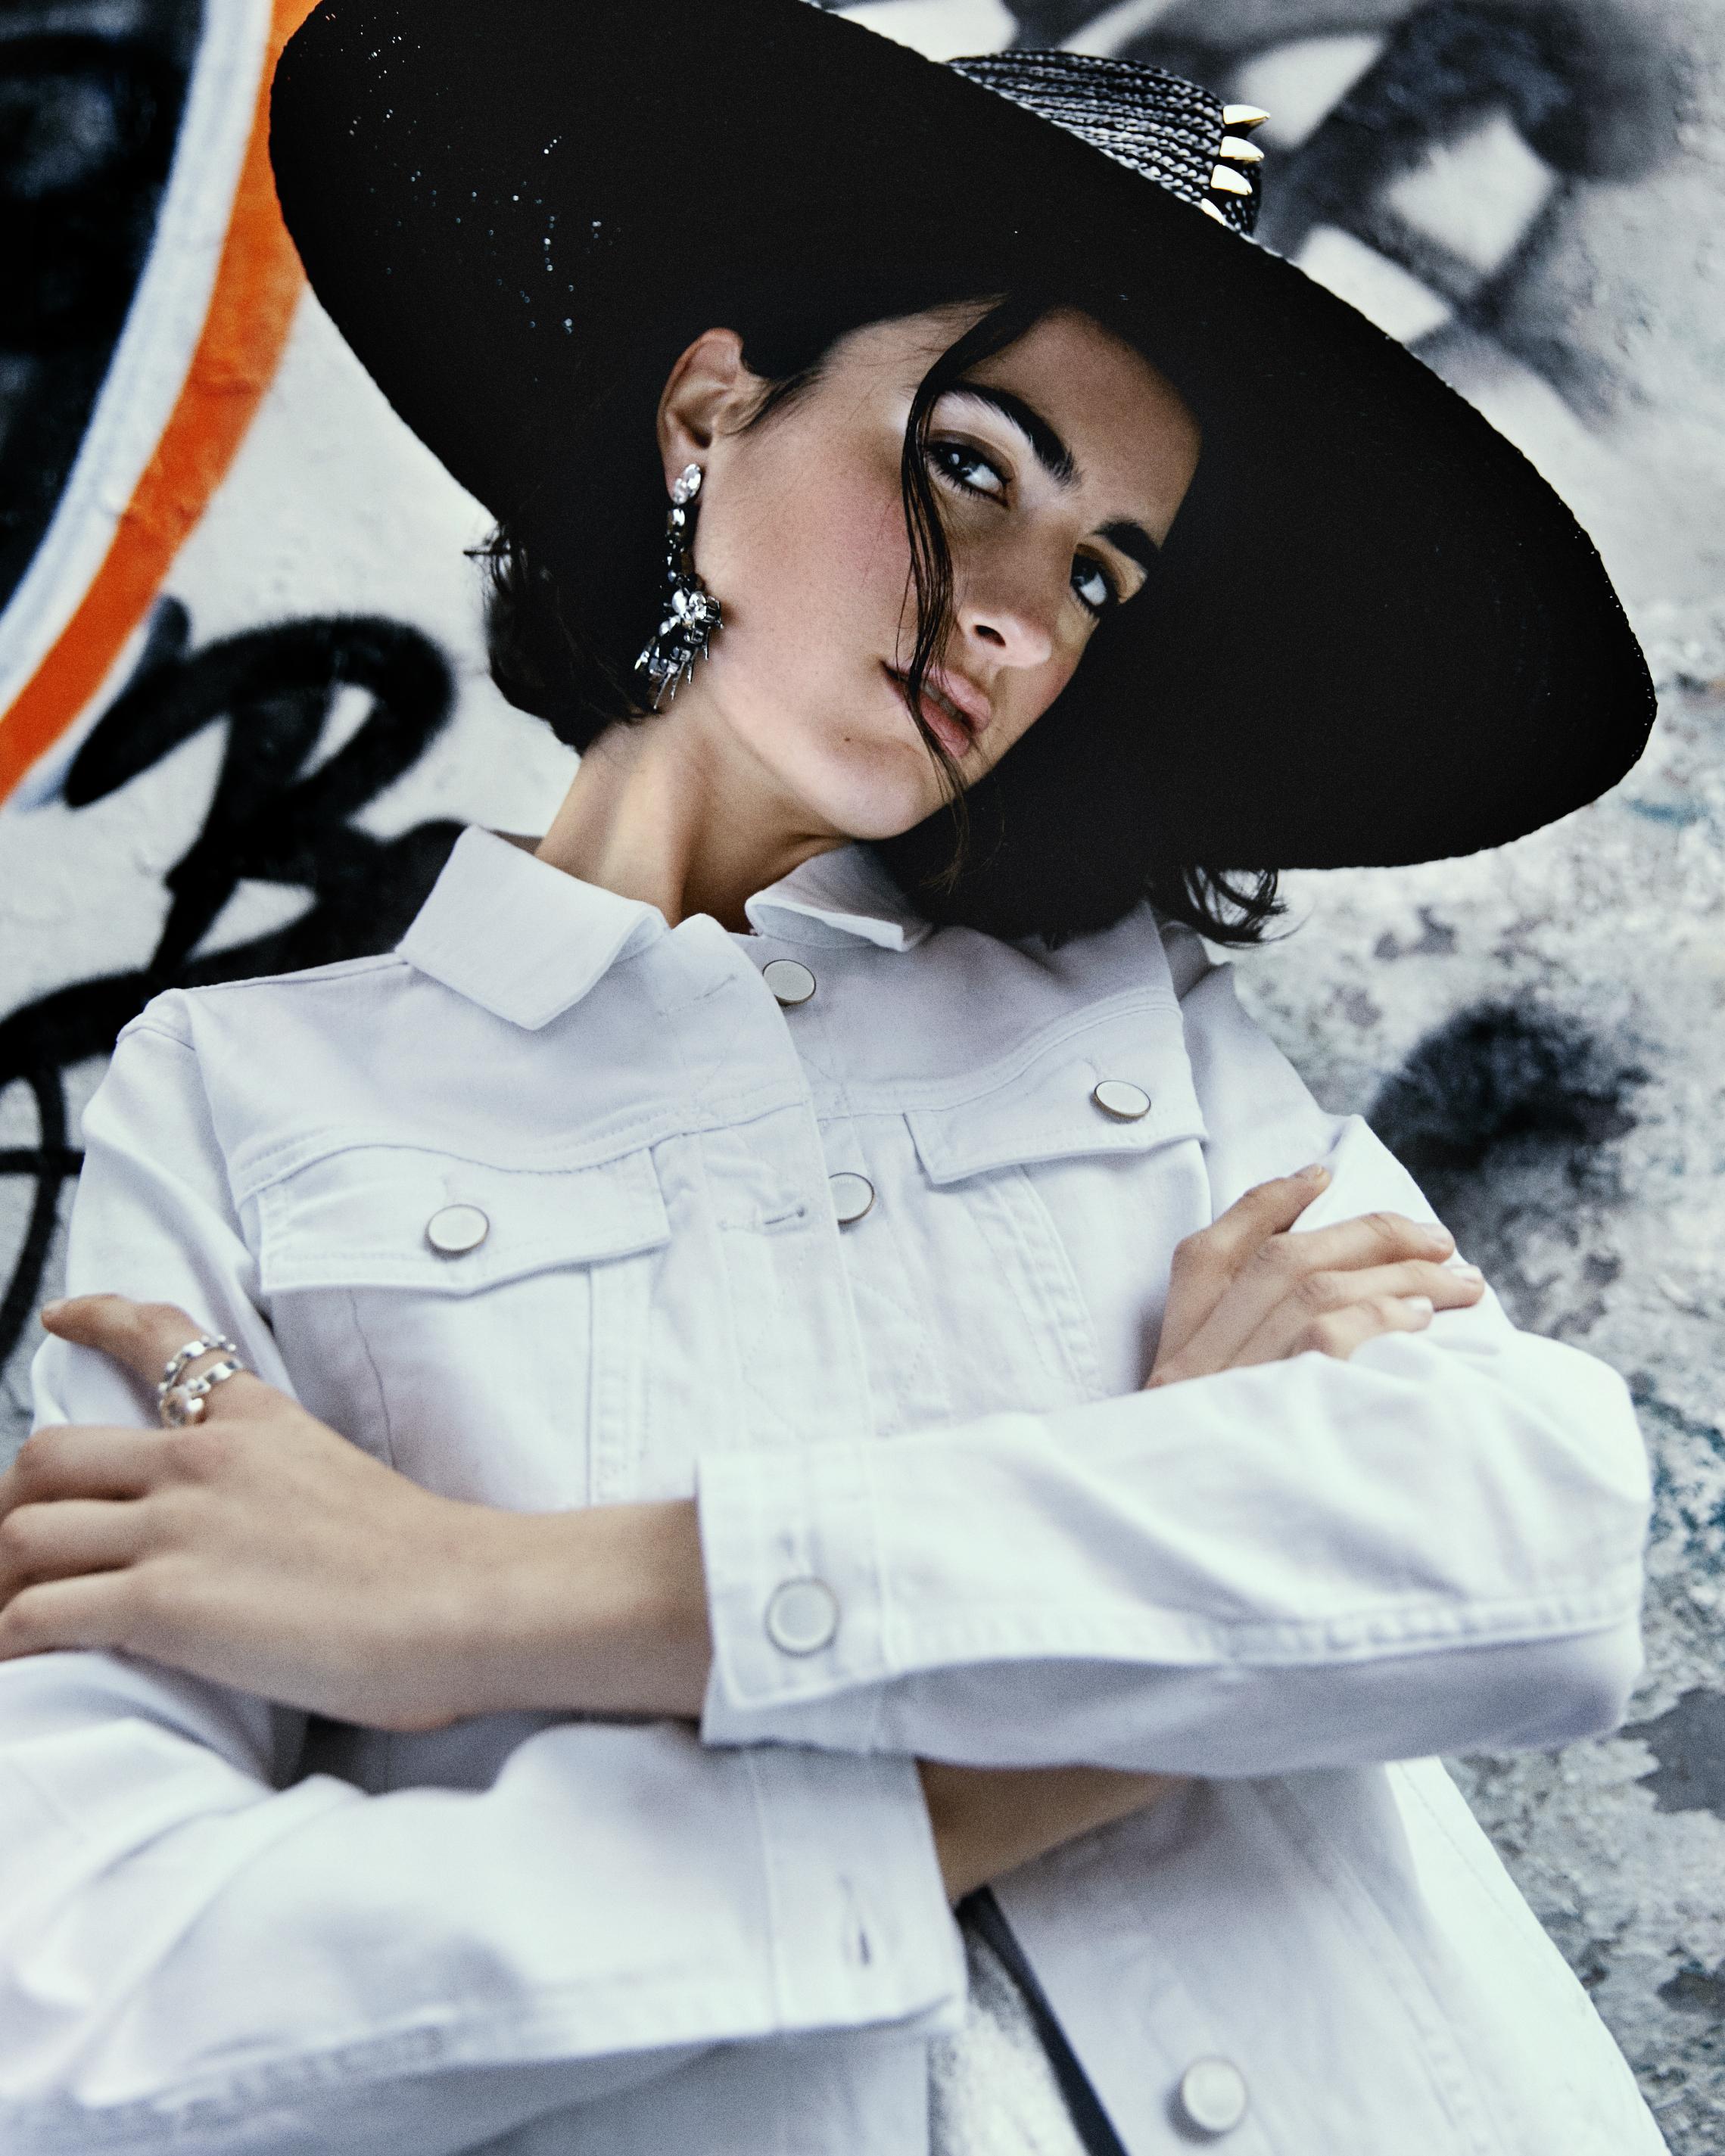 Hat – THAT HAT MADRID  Earrings – ALDAZABAL  Rings – SANTAVANITAS  Jacket – AMICHI  Trousers – ANONYME DESIGNERS  Swim suit – UONDI